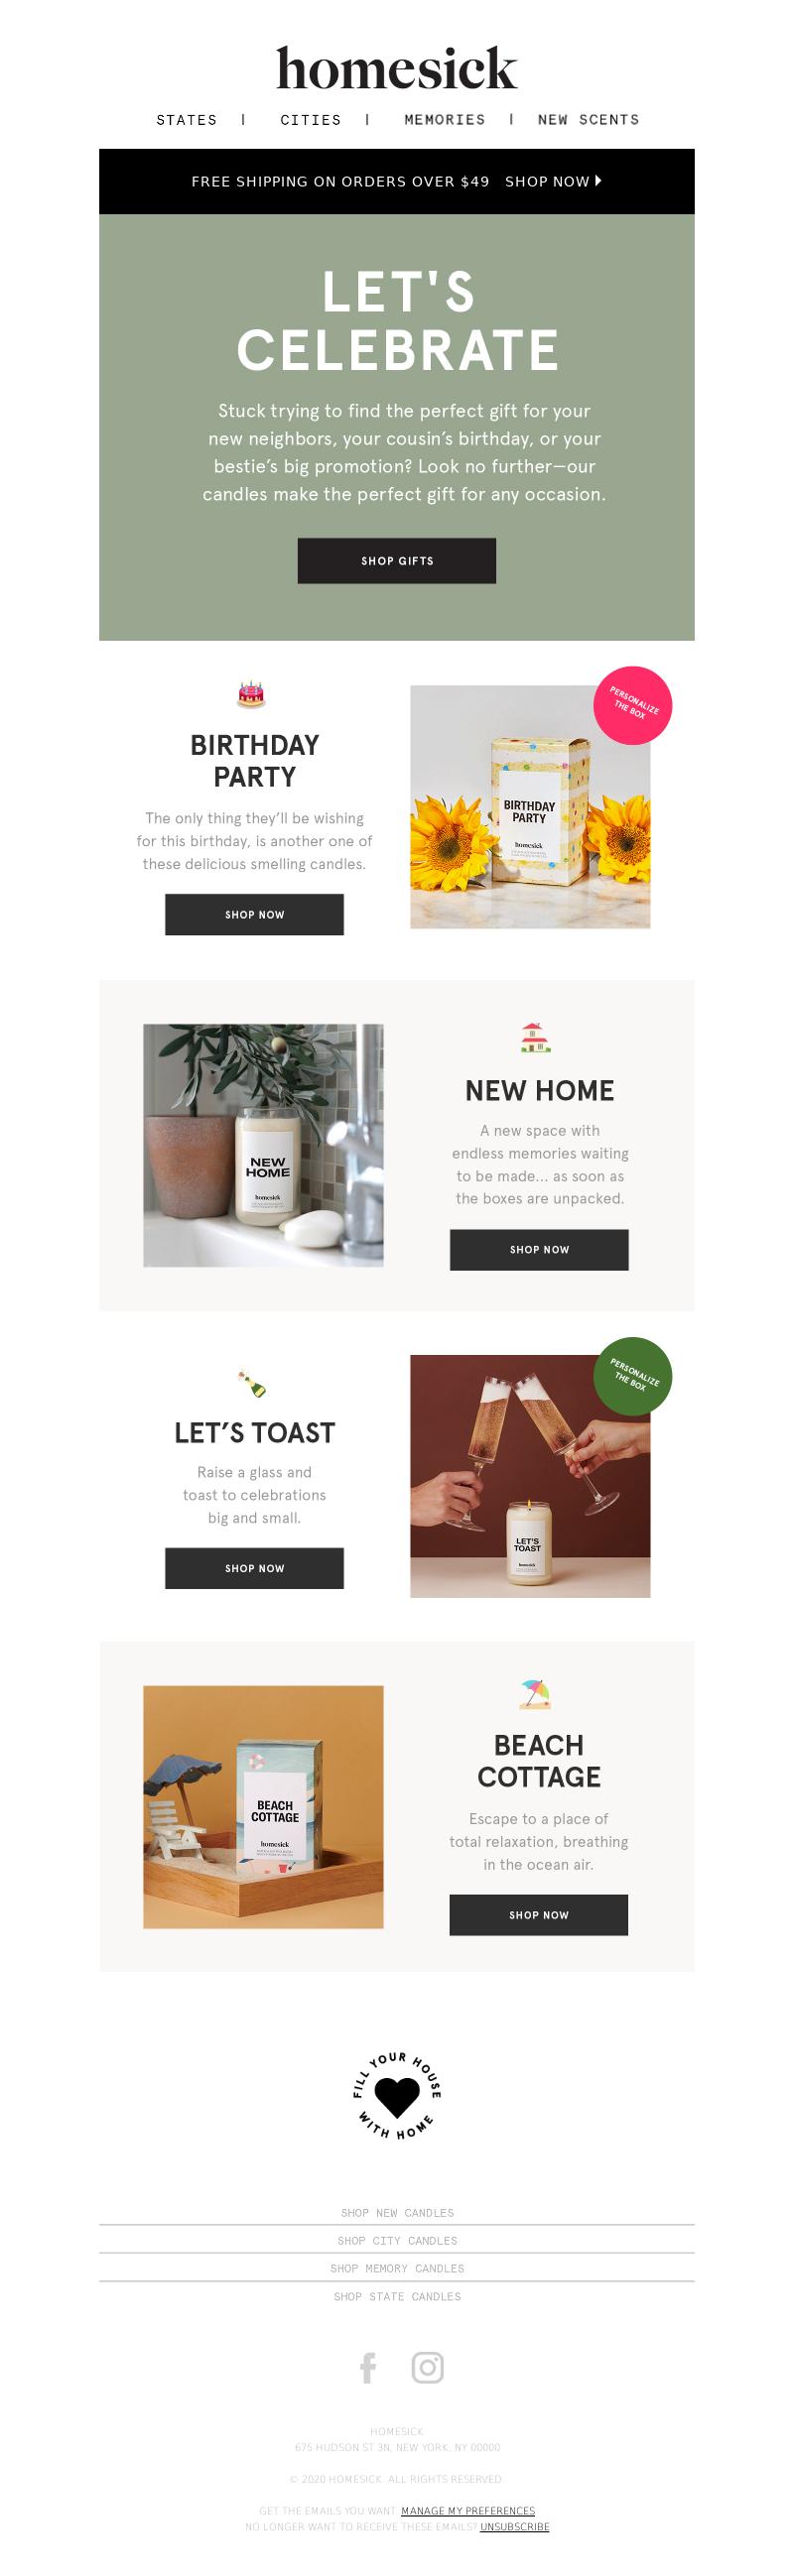 Homesick Candles - We make gift giving easy 🎁